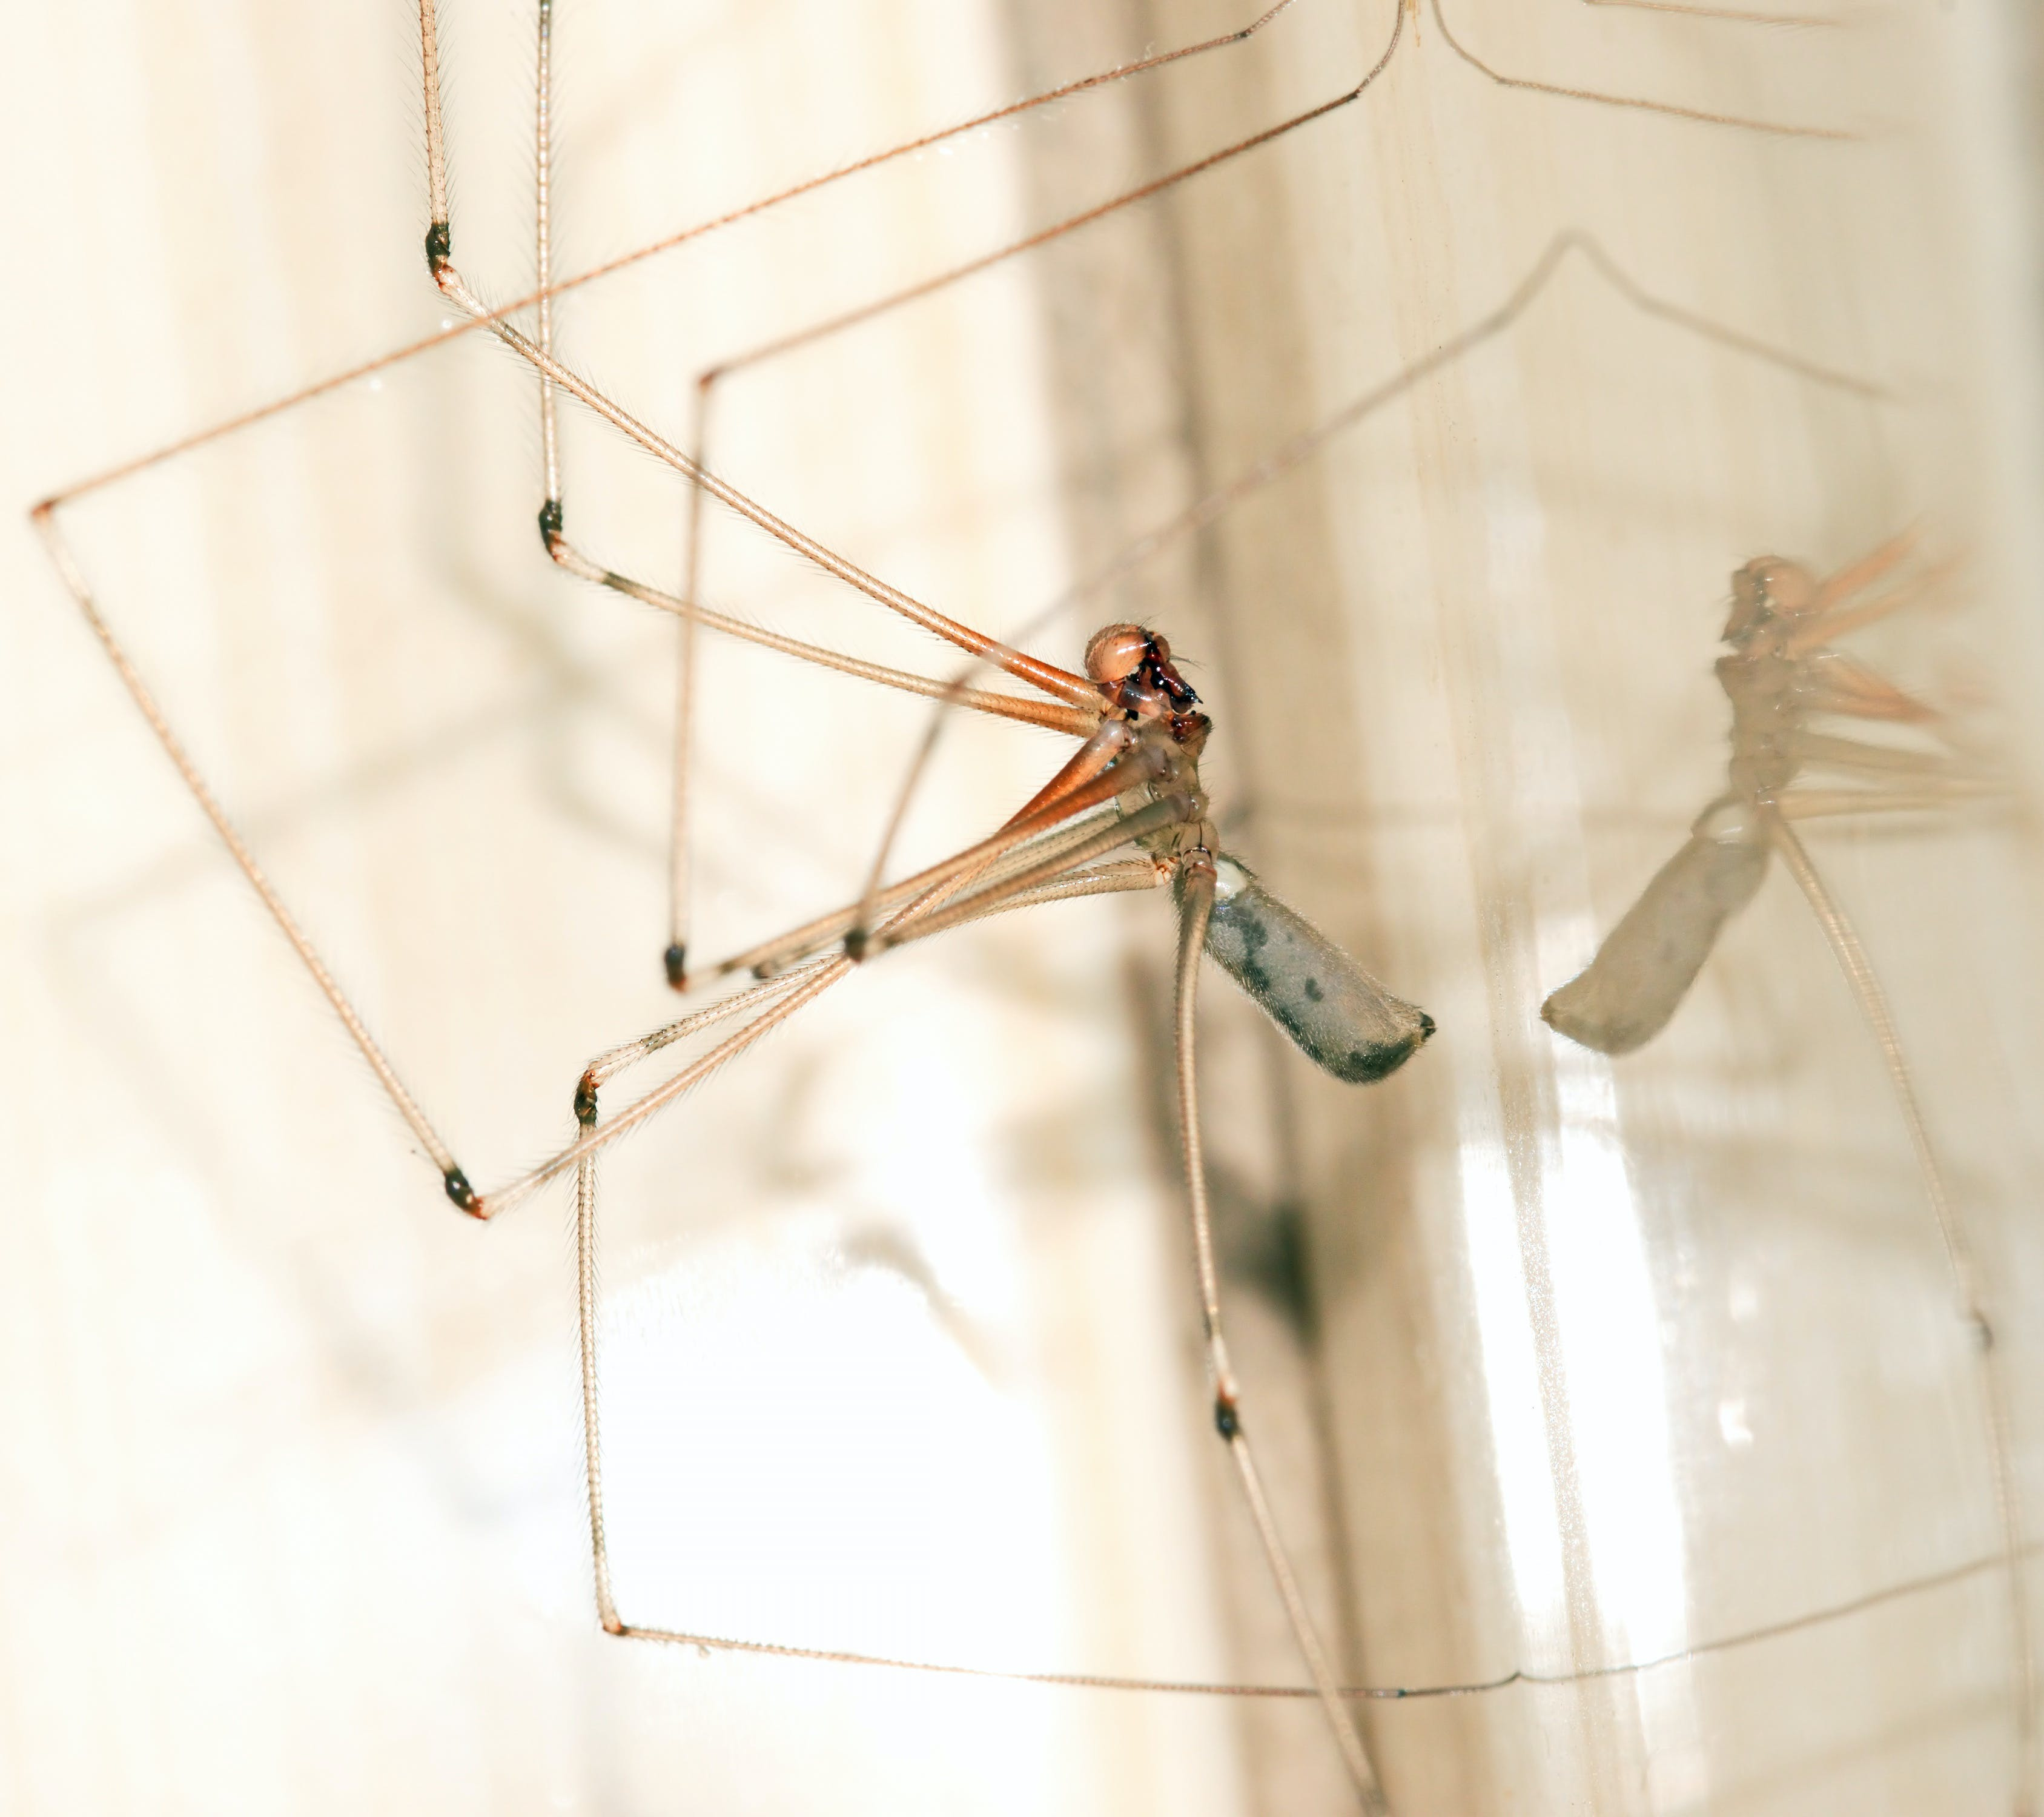 Cellar Spider Closeup Photography